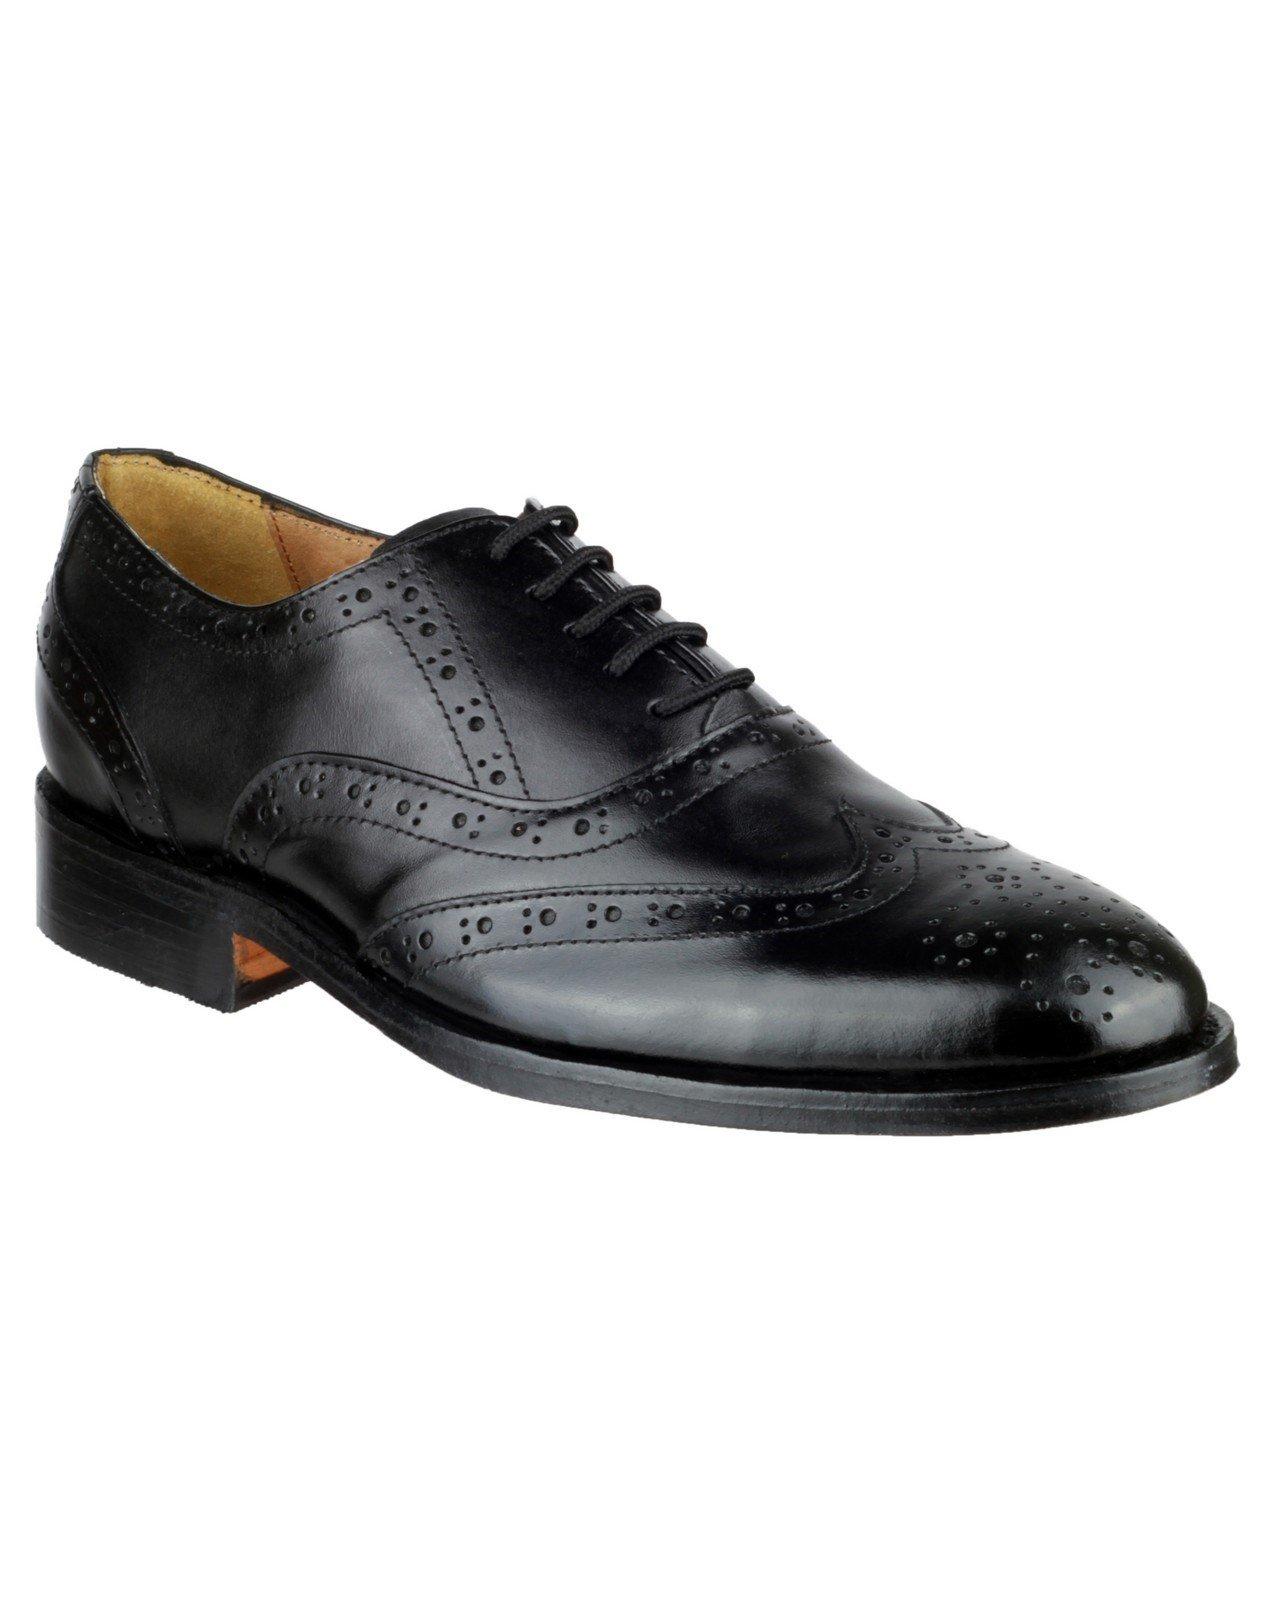 Amblers Women's Ben Leather Soled Oxford Black 10875 - Black 6